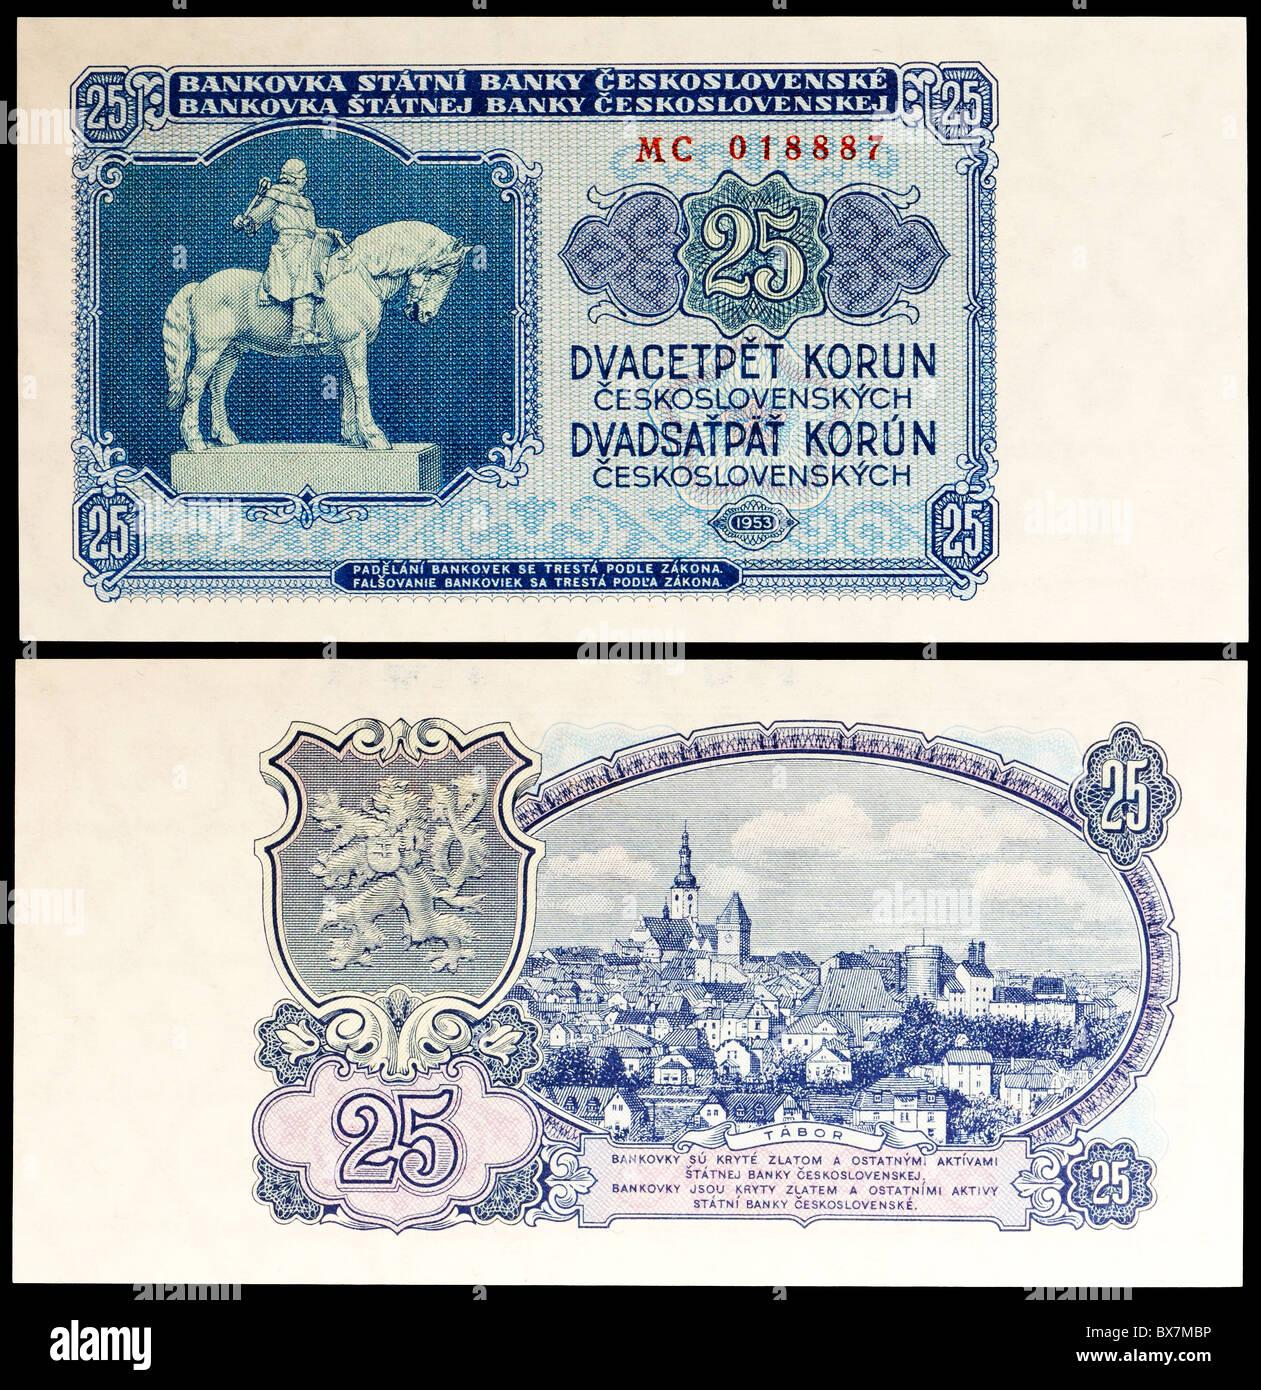 Czechoslovakian 25 Korun / Crown banknote from 1953 - Stock Image